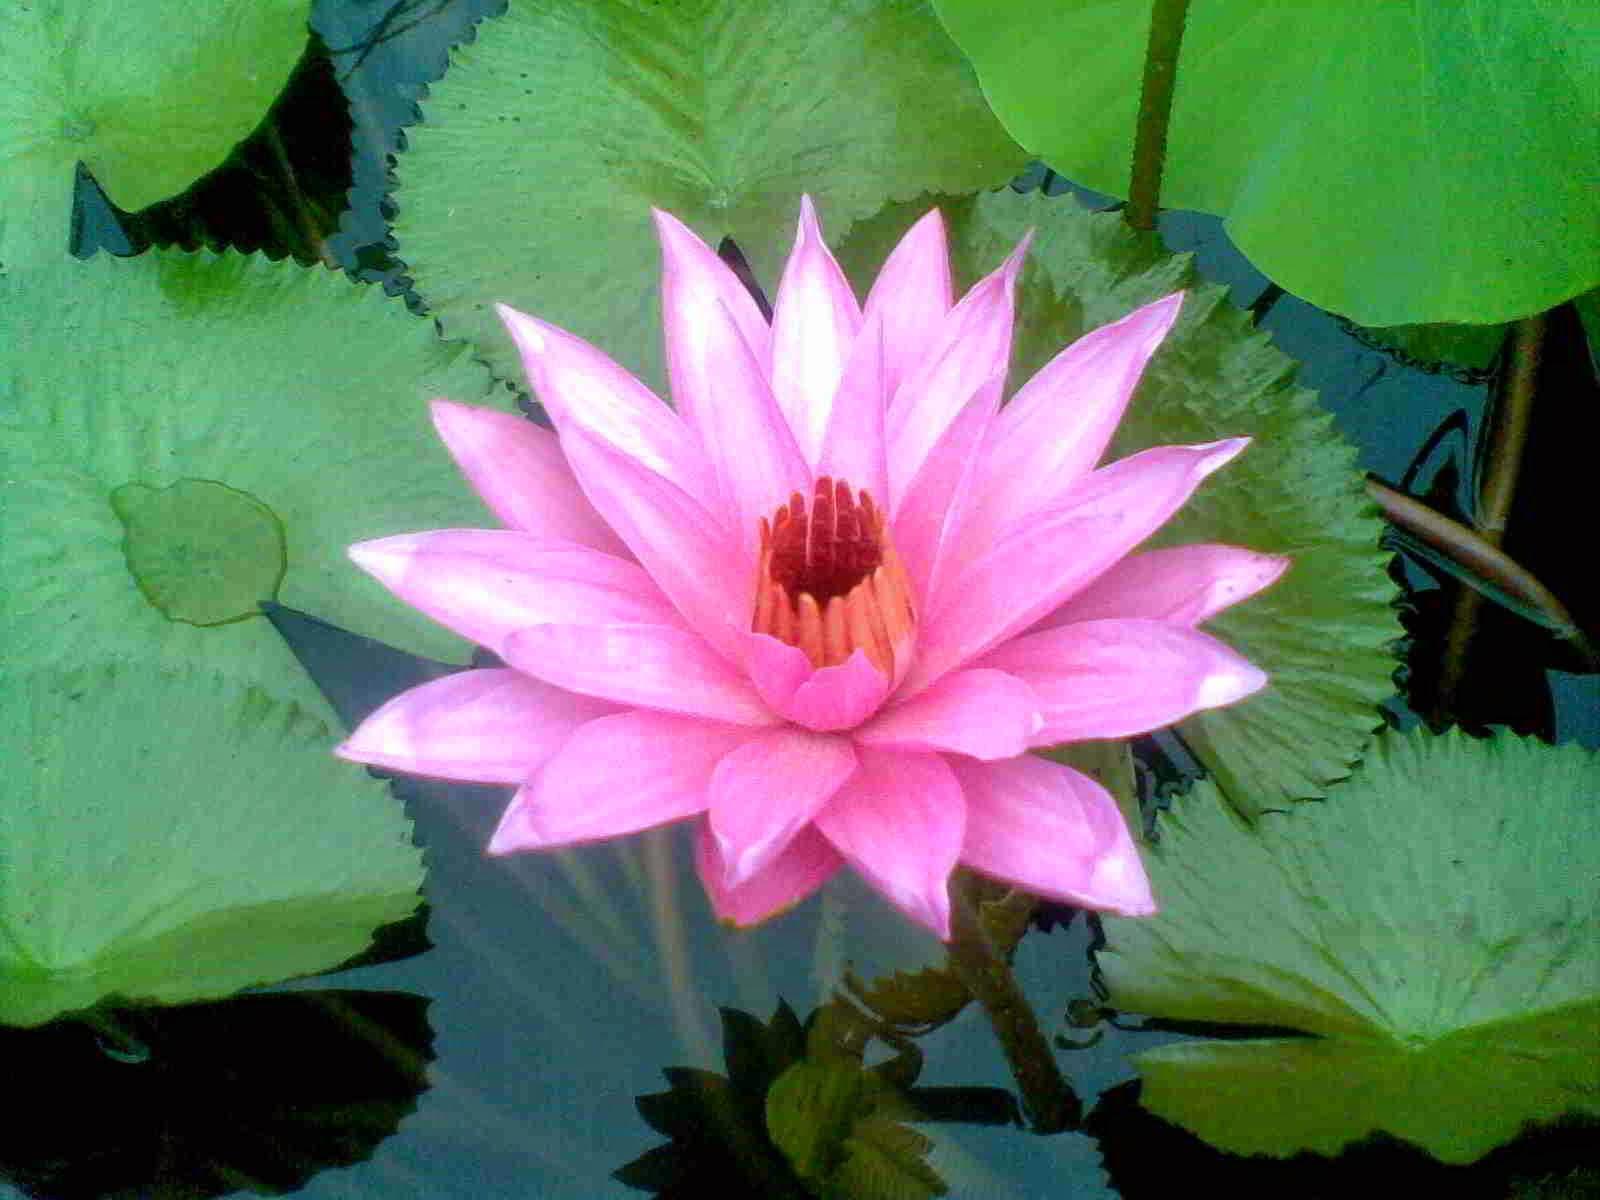 Khasiat dan Manfaat Bunga Teratai